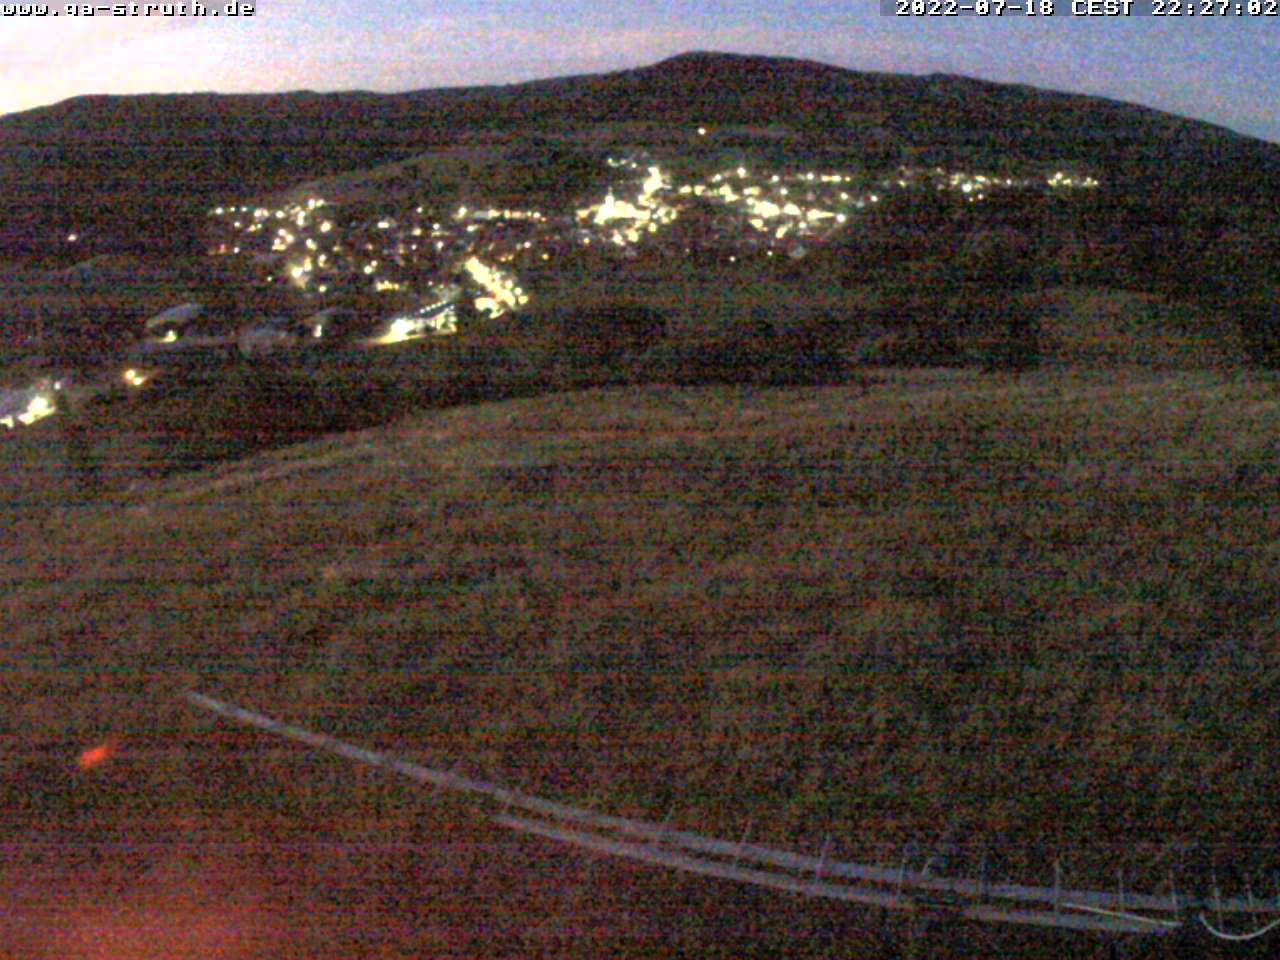 Webcam Floh-Seligenthal Antenne Struth-Helmershof Kohlberg